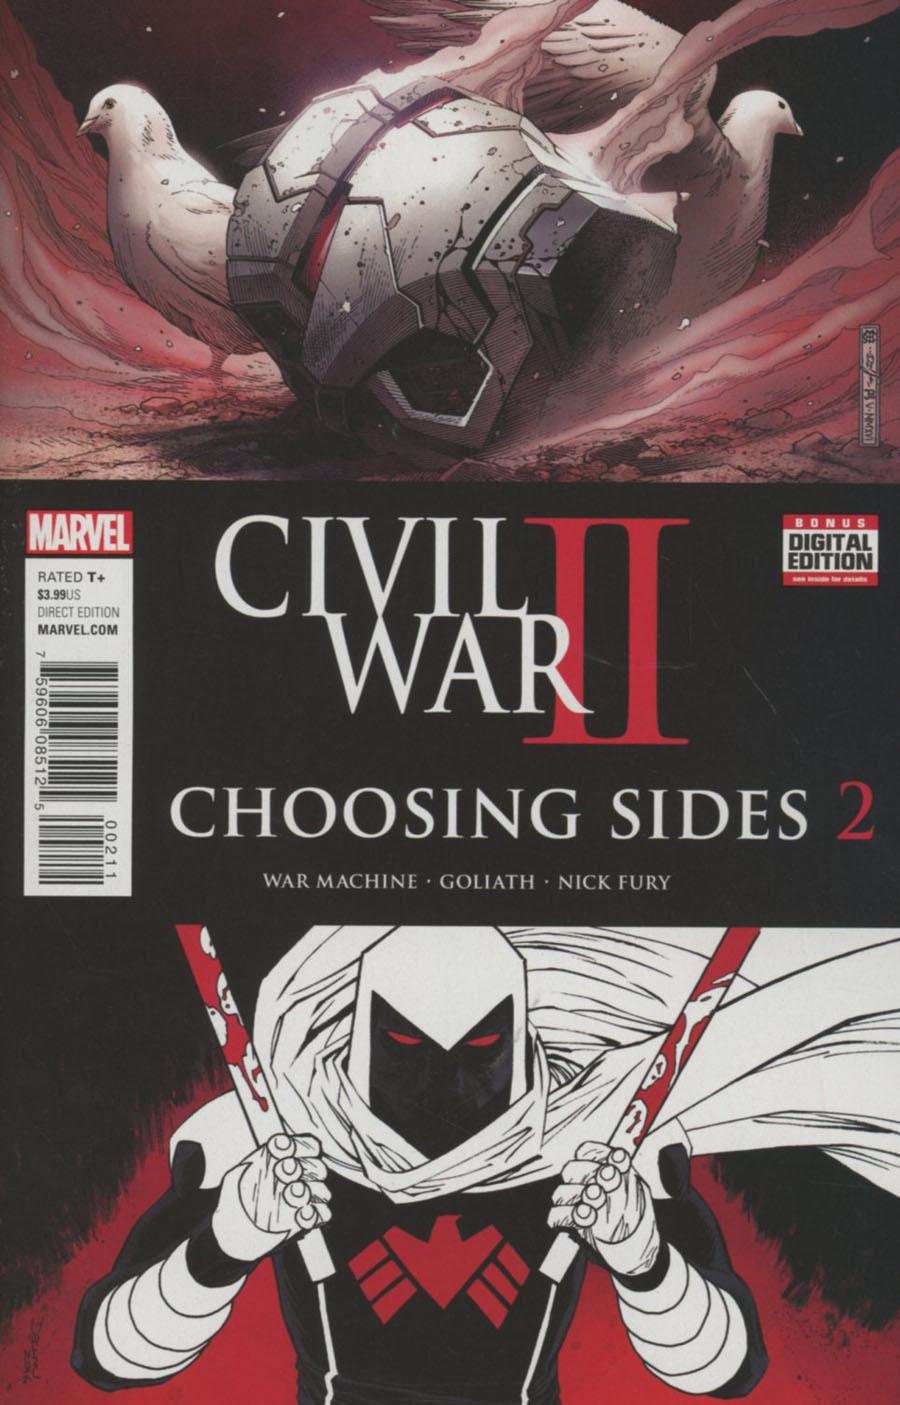 Civil War II Choosing Sides #2 Cover A Regular Jim Cheung & Declan Shalvey Cover